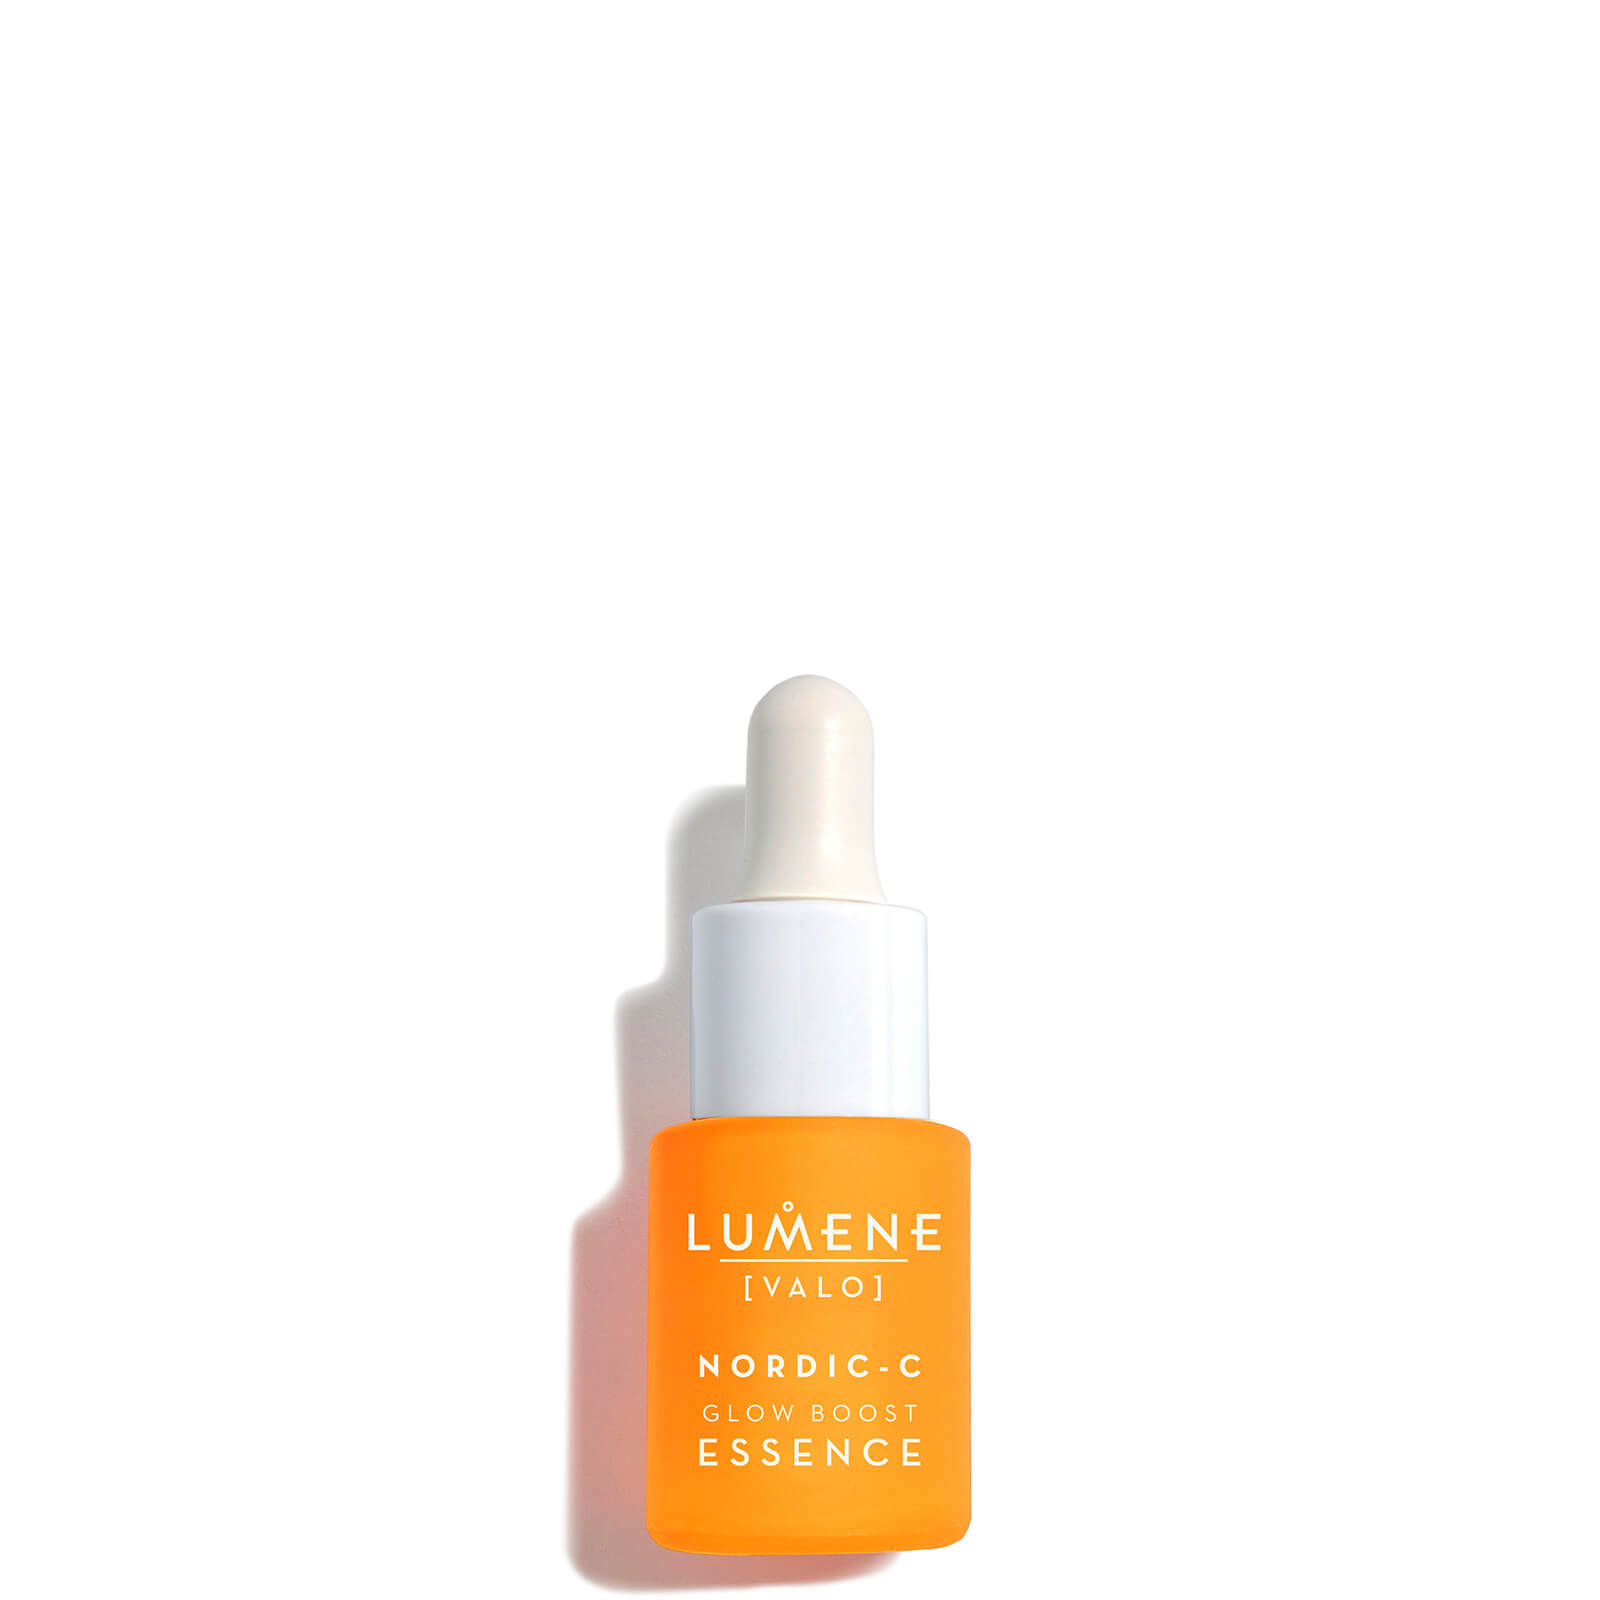 Купить Lumene Nordic-C [VALO] Glow Boost Mini Essence 15ml